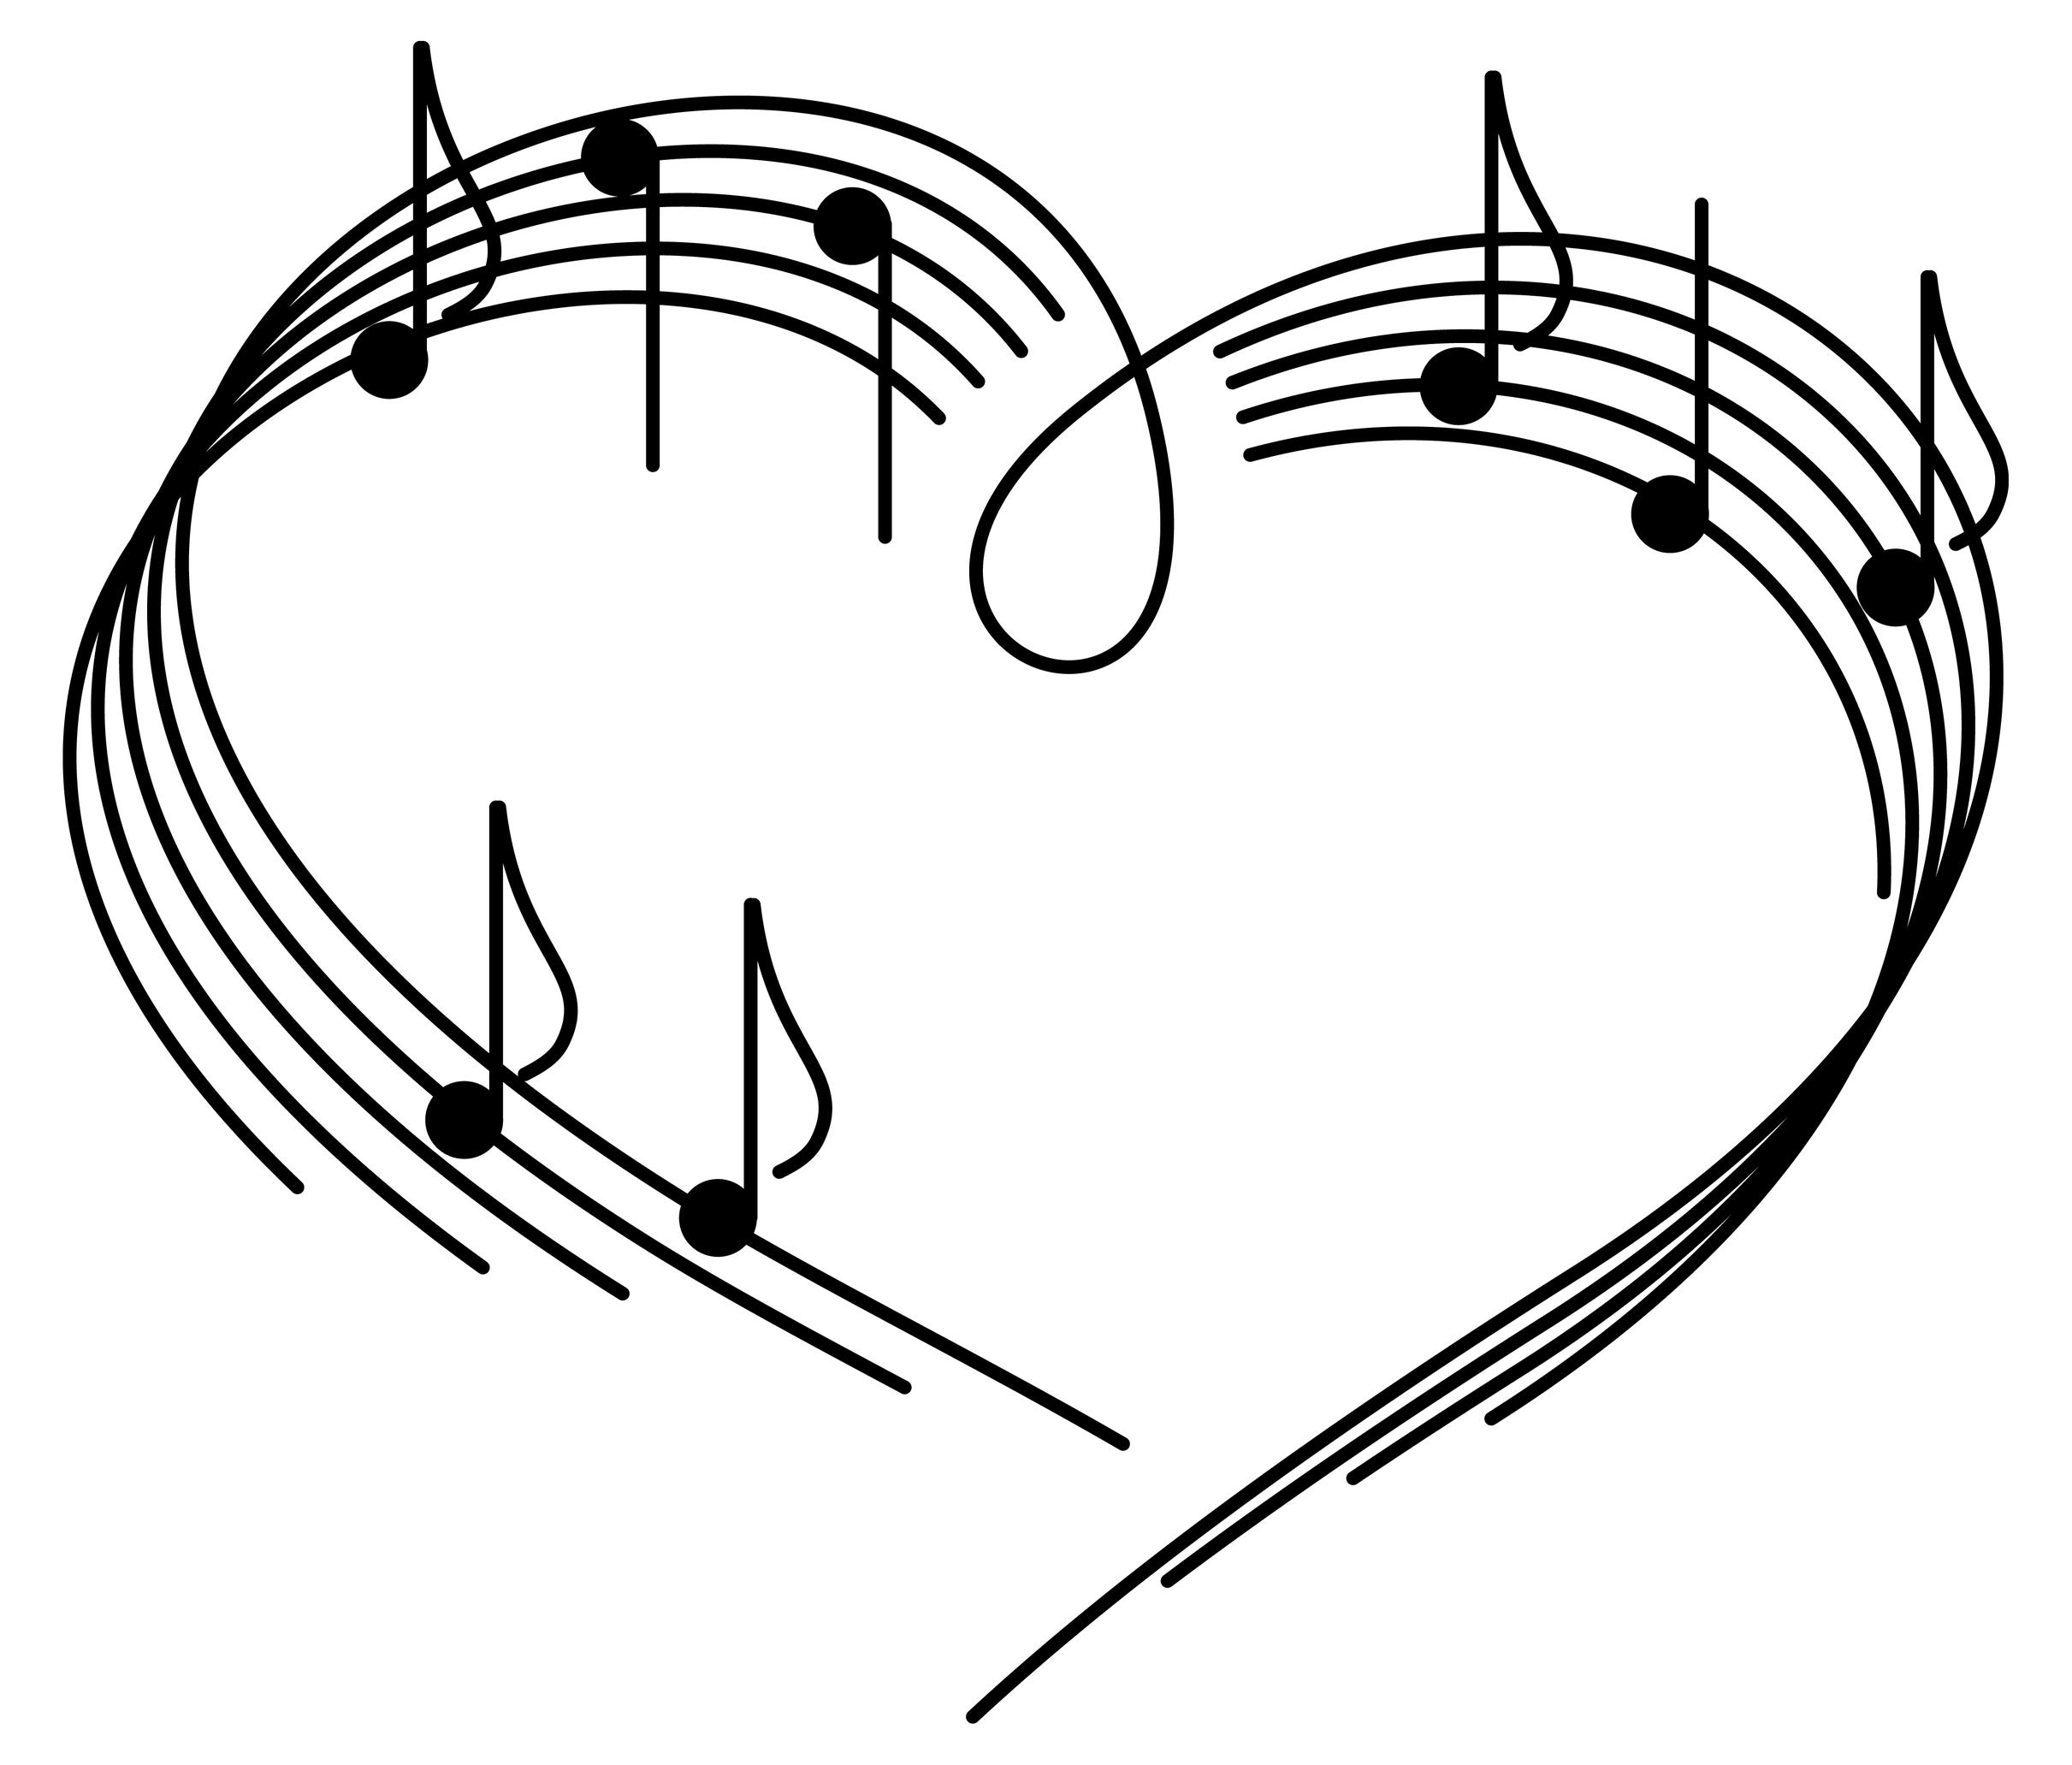 Images of music symbols free download best images of music 2422x2063 heart music symbols bg buycottarizona